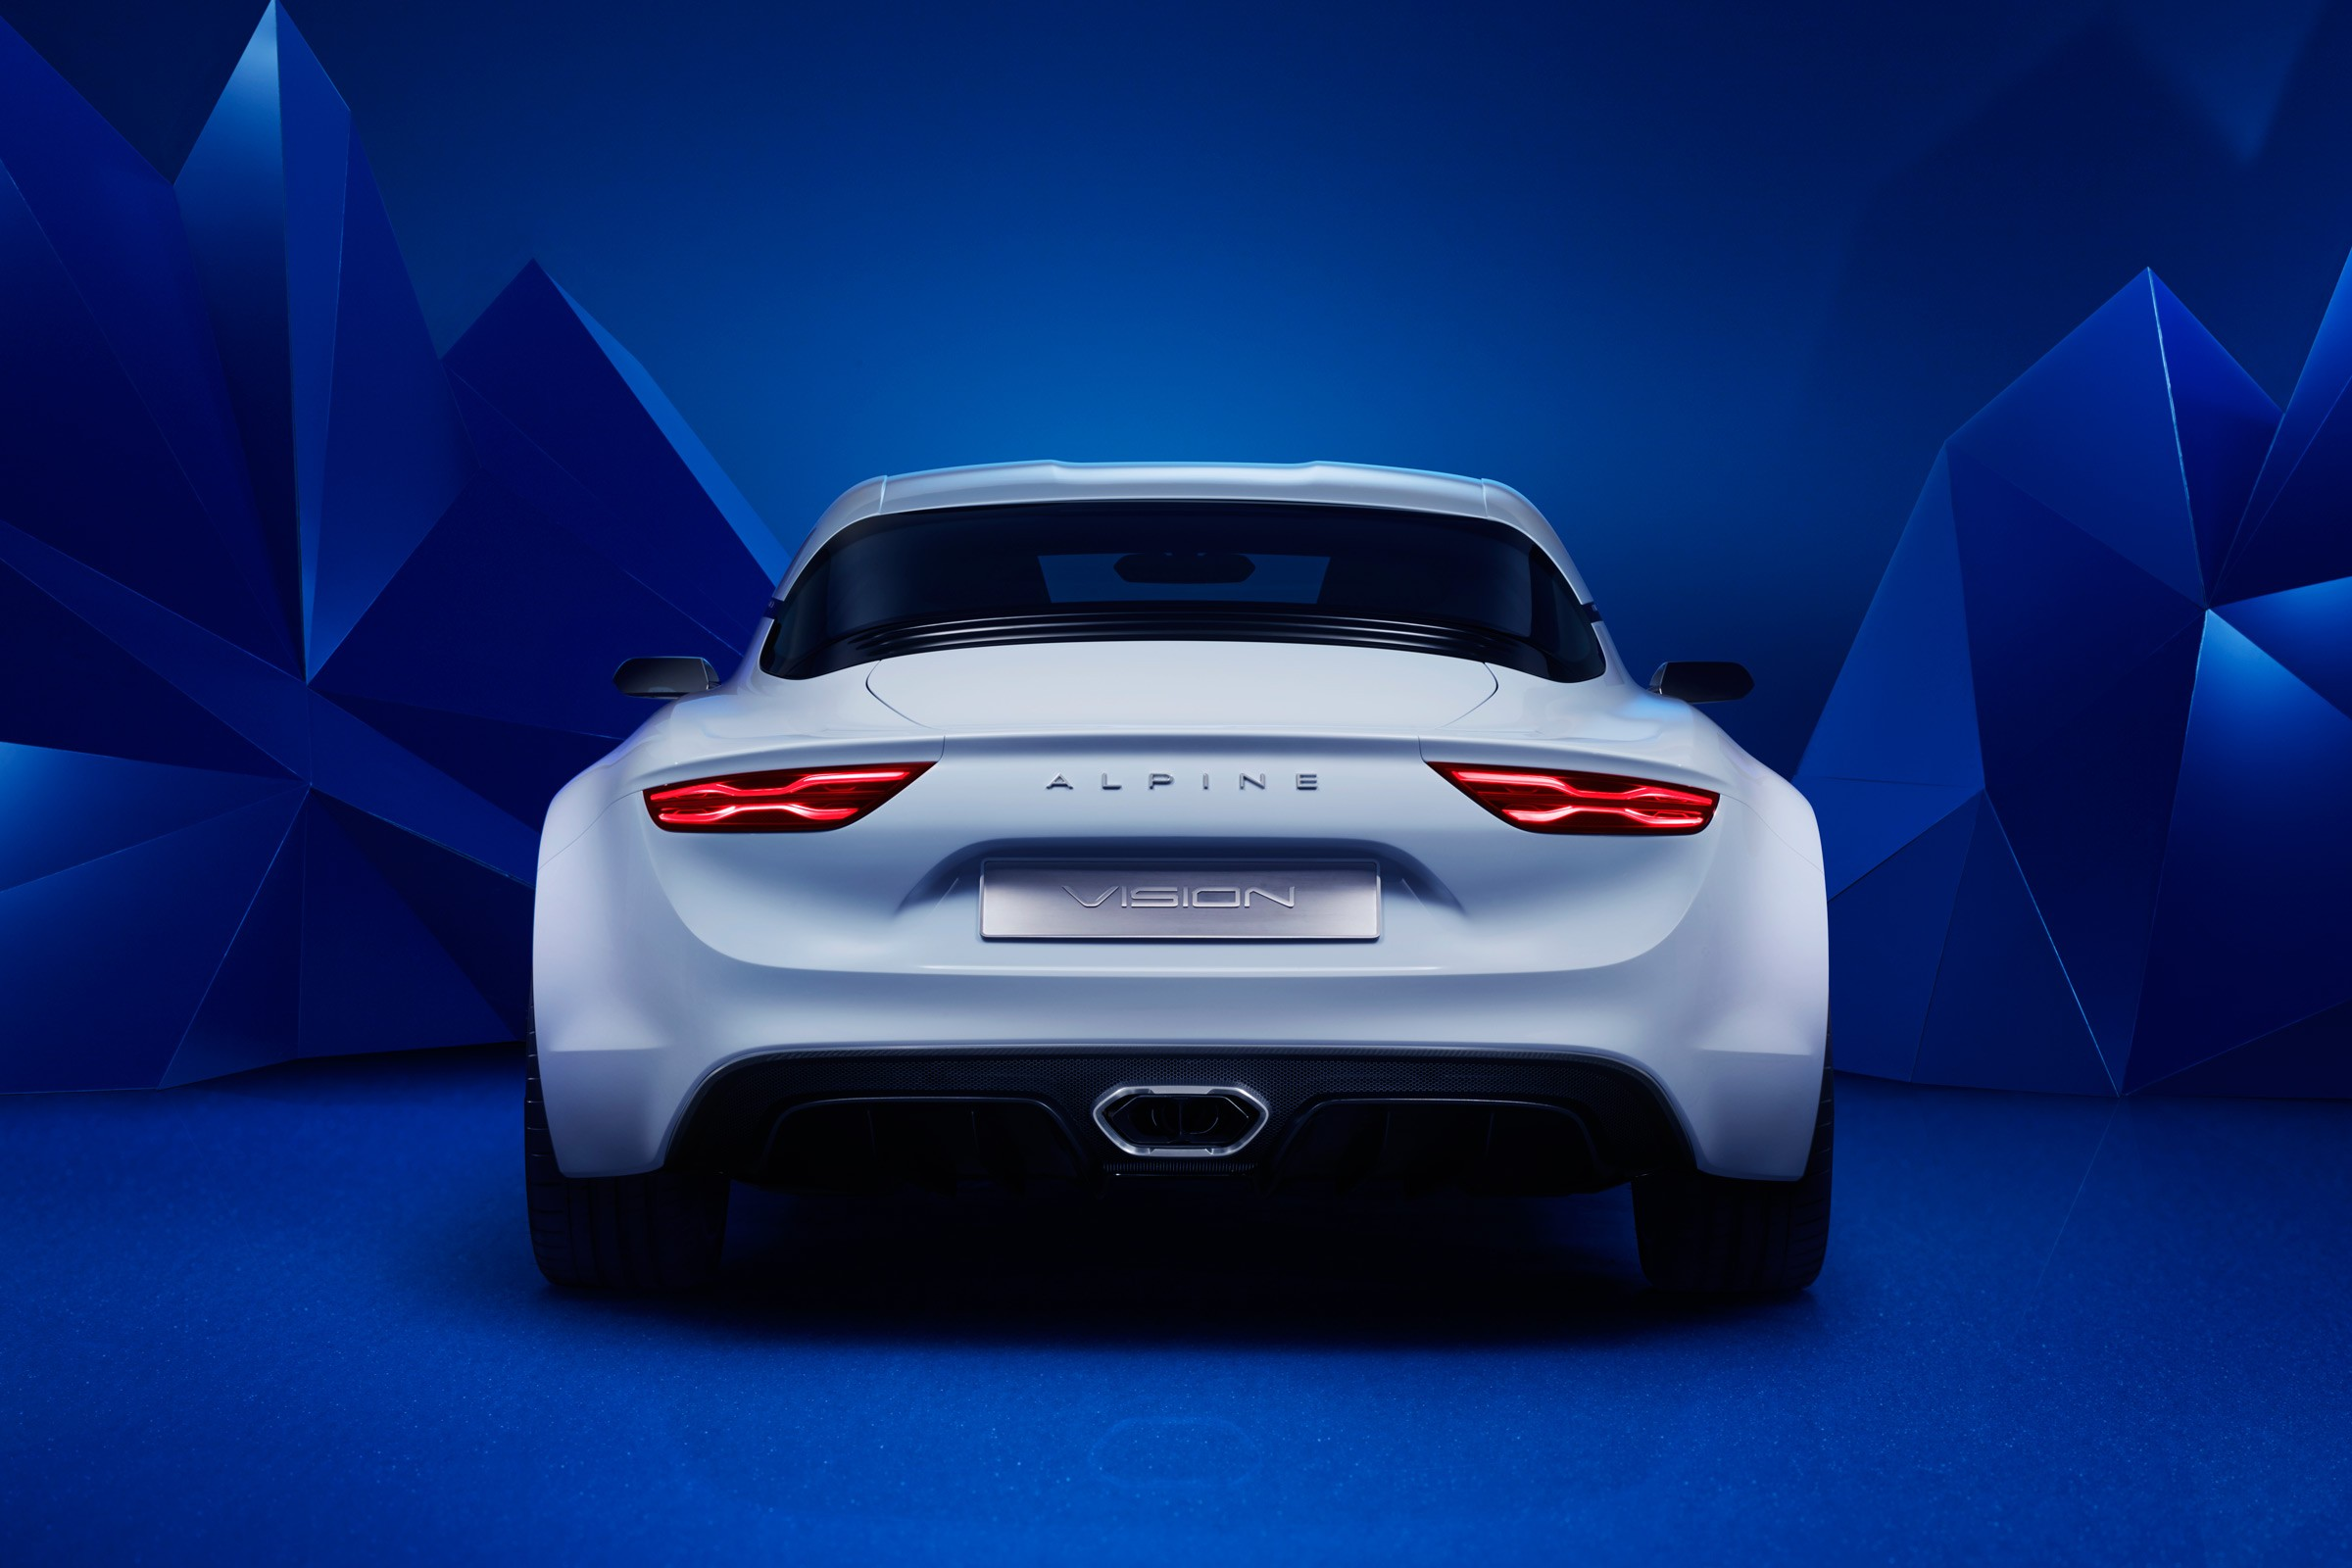 2018 renault alpine. beautiful alpine alpine vision concept intended 2018 renault alpine d